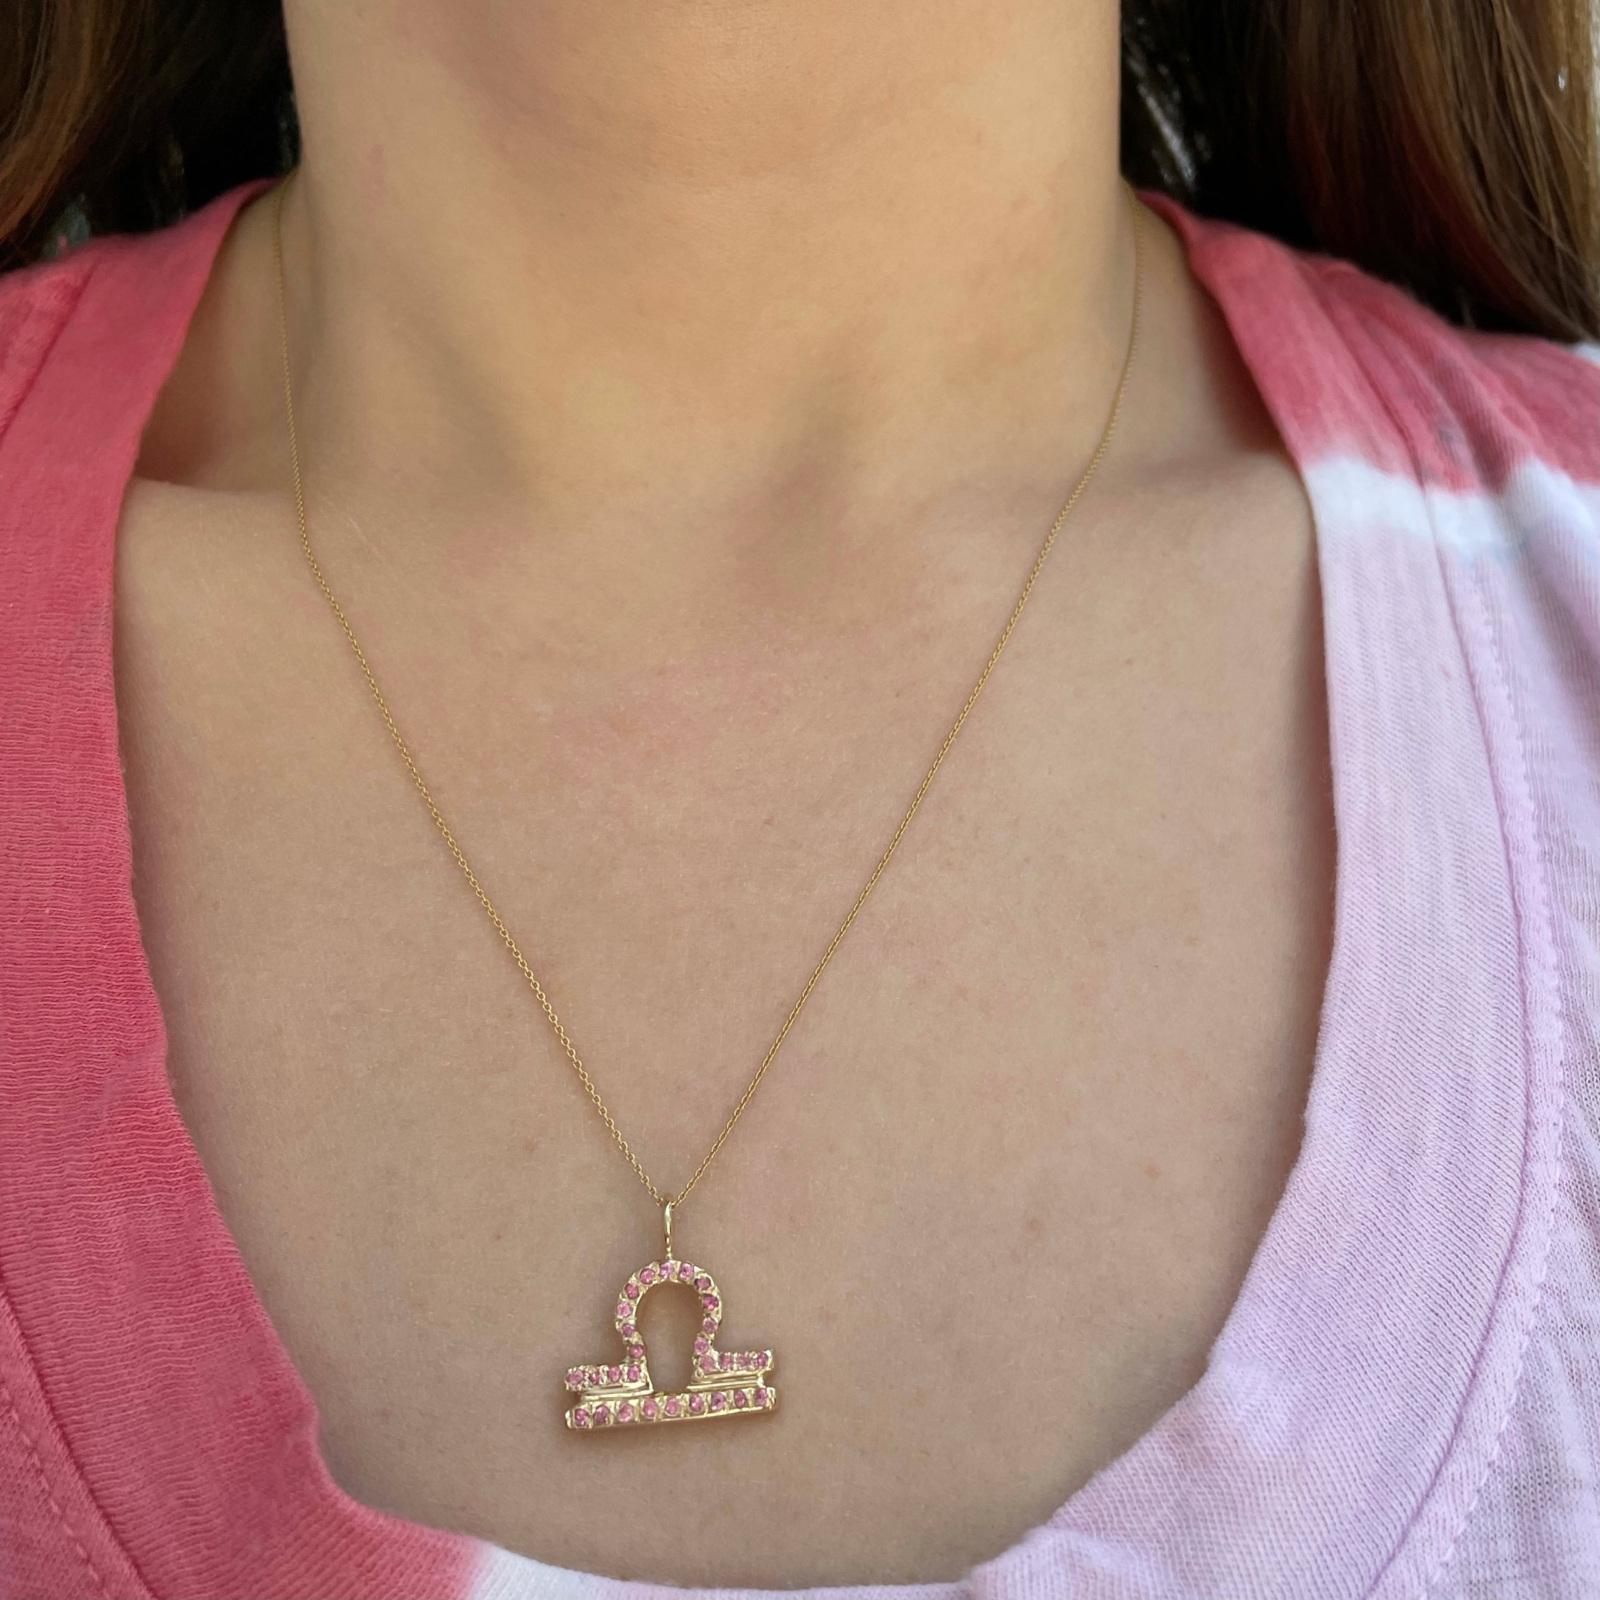 Libra zodiac sign charm pendant necklace